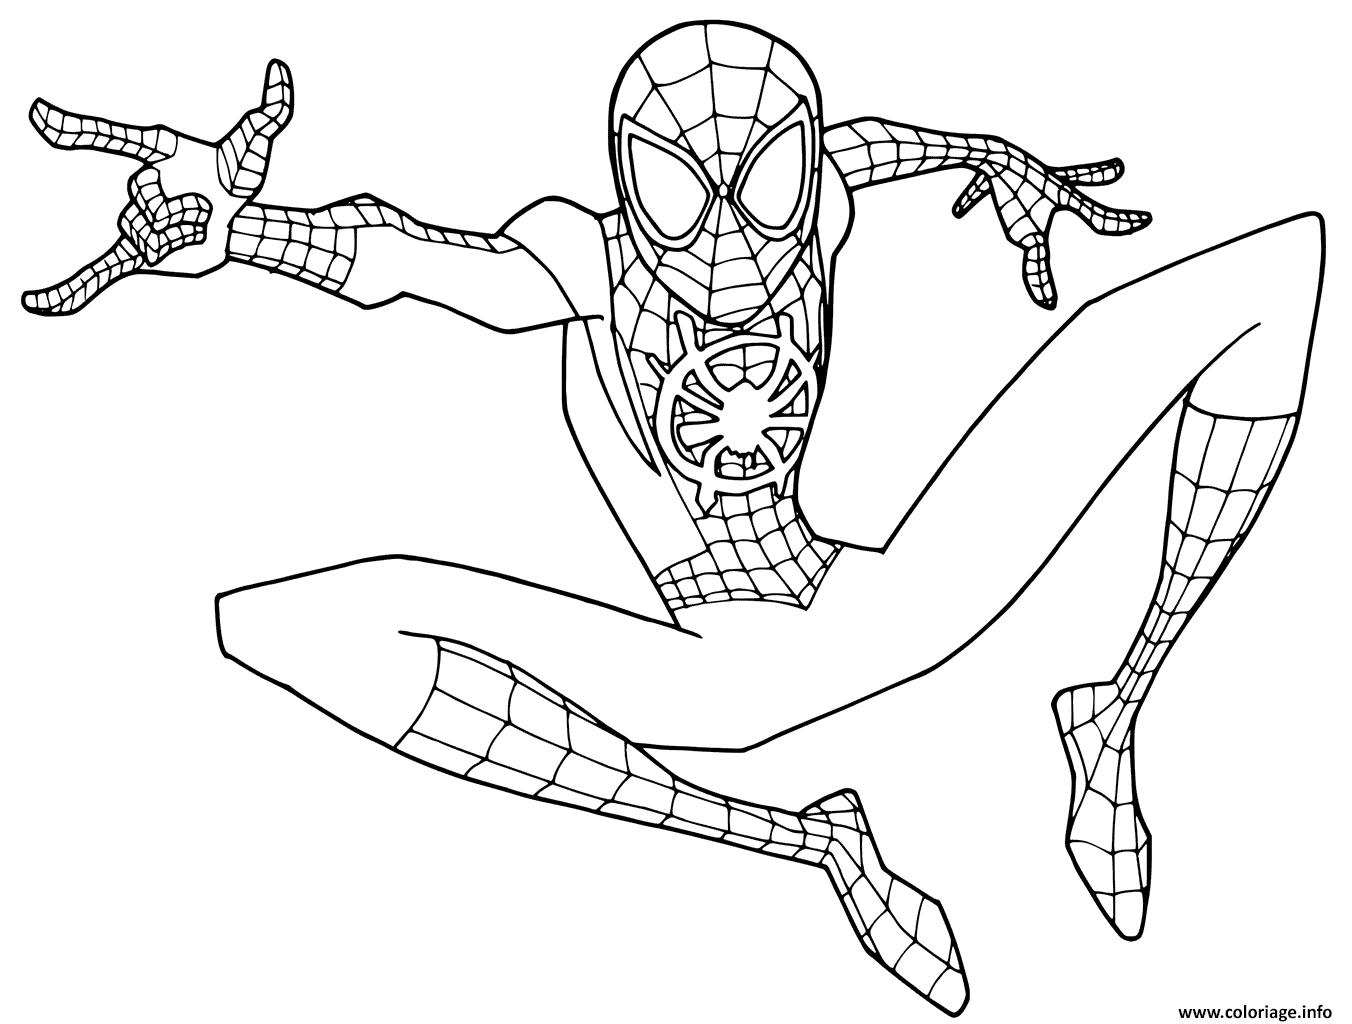 Coloriage Spiderman A Imprimer